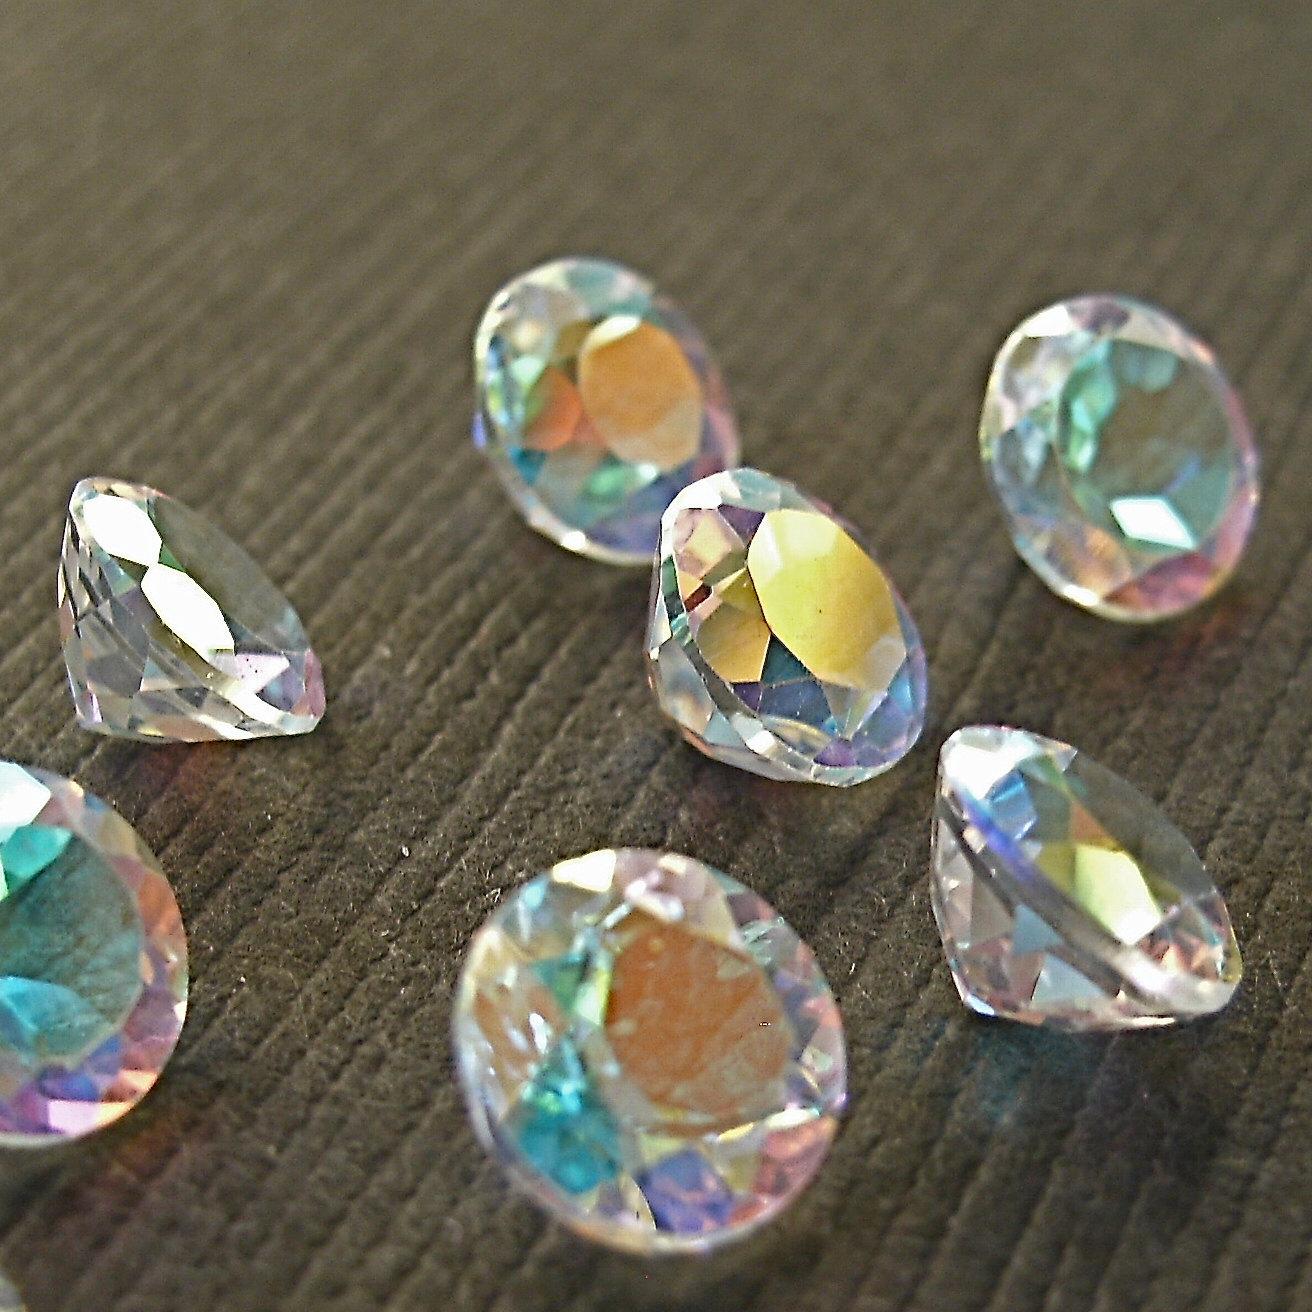 faceted gemstones topaz mercury mist cut aaa 6mm for